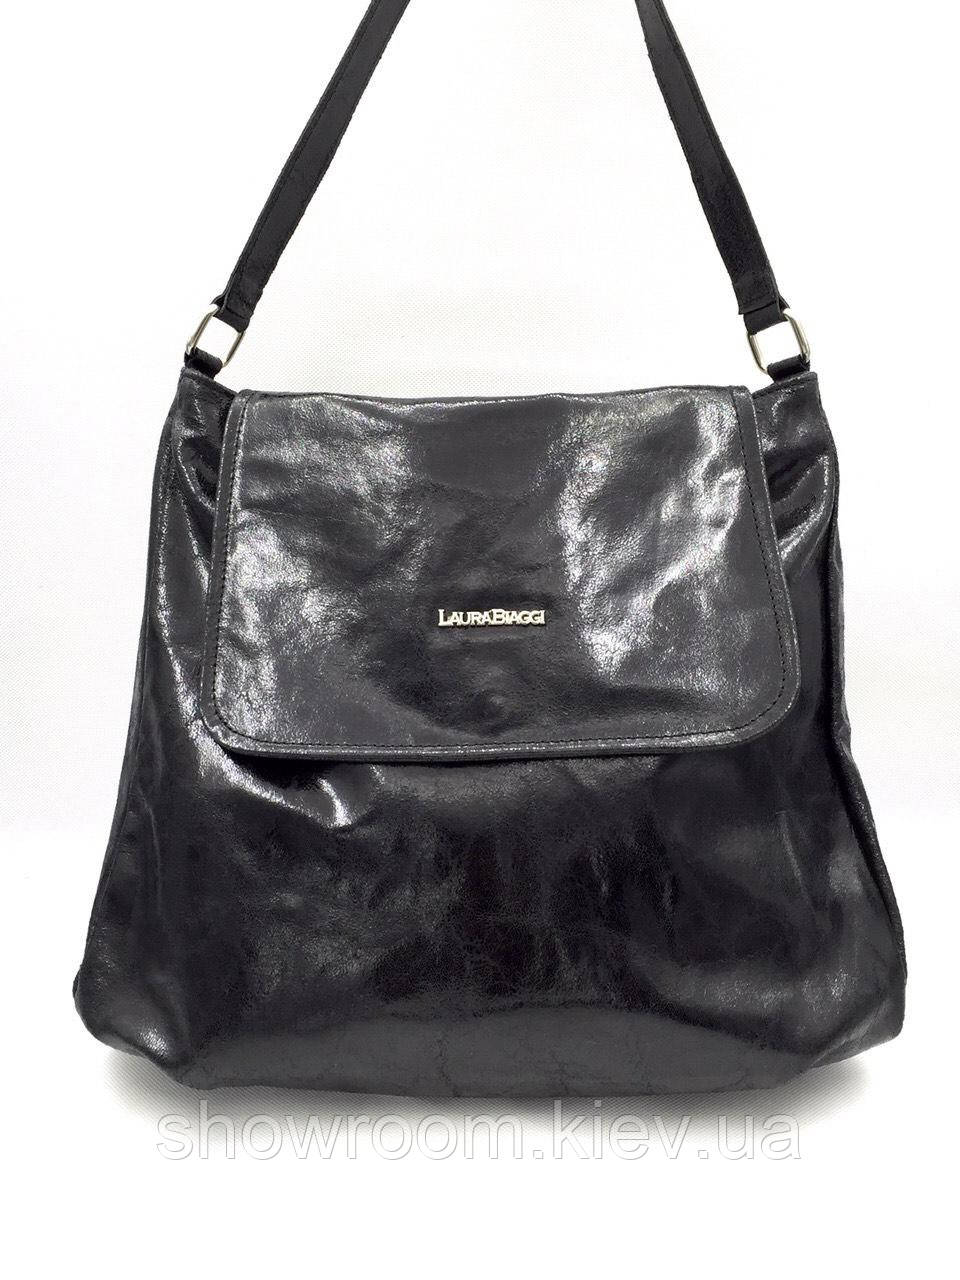 Женская сумка Laura Biaggi (1129 black) leather